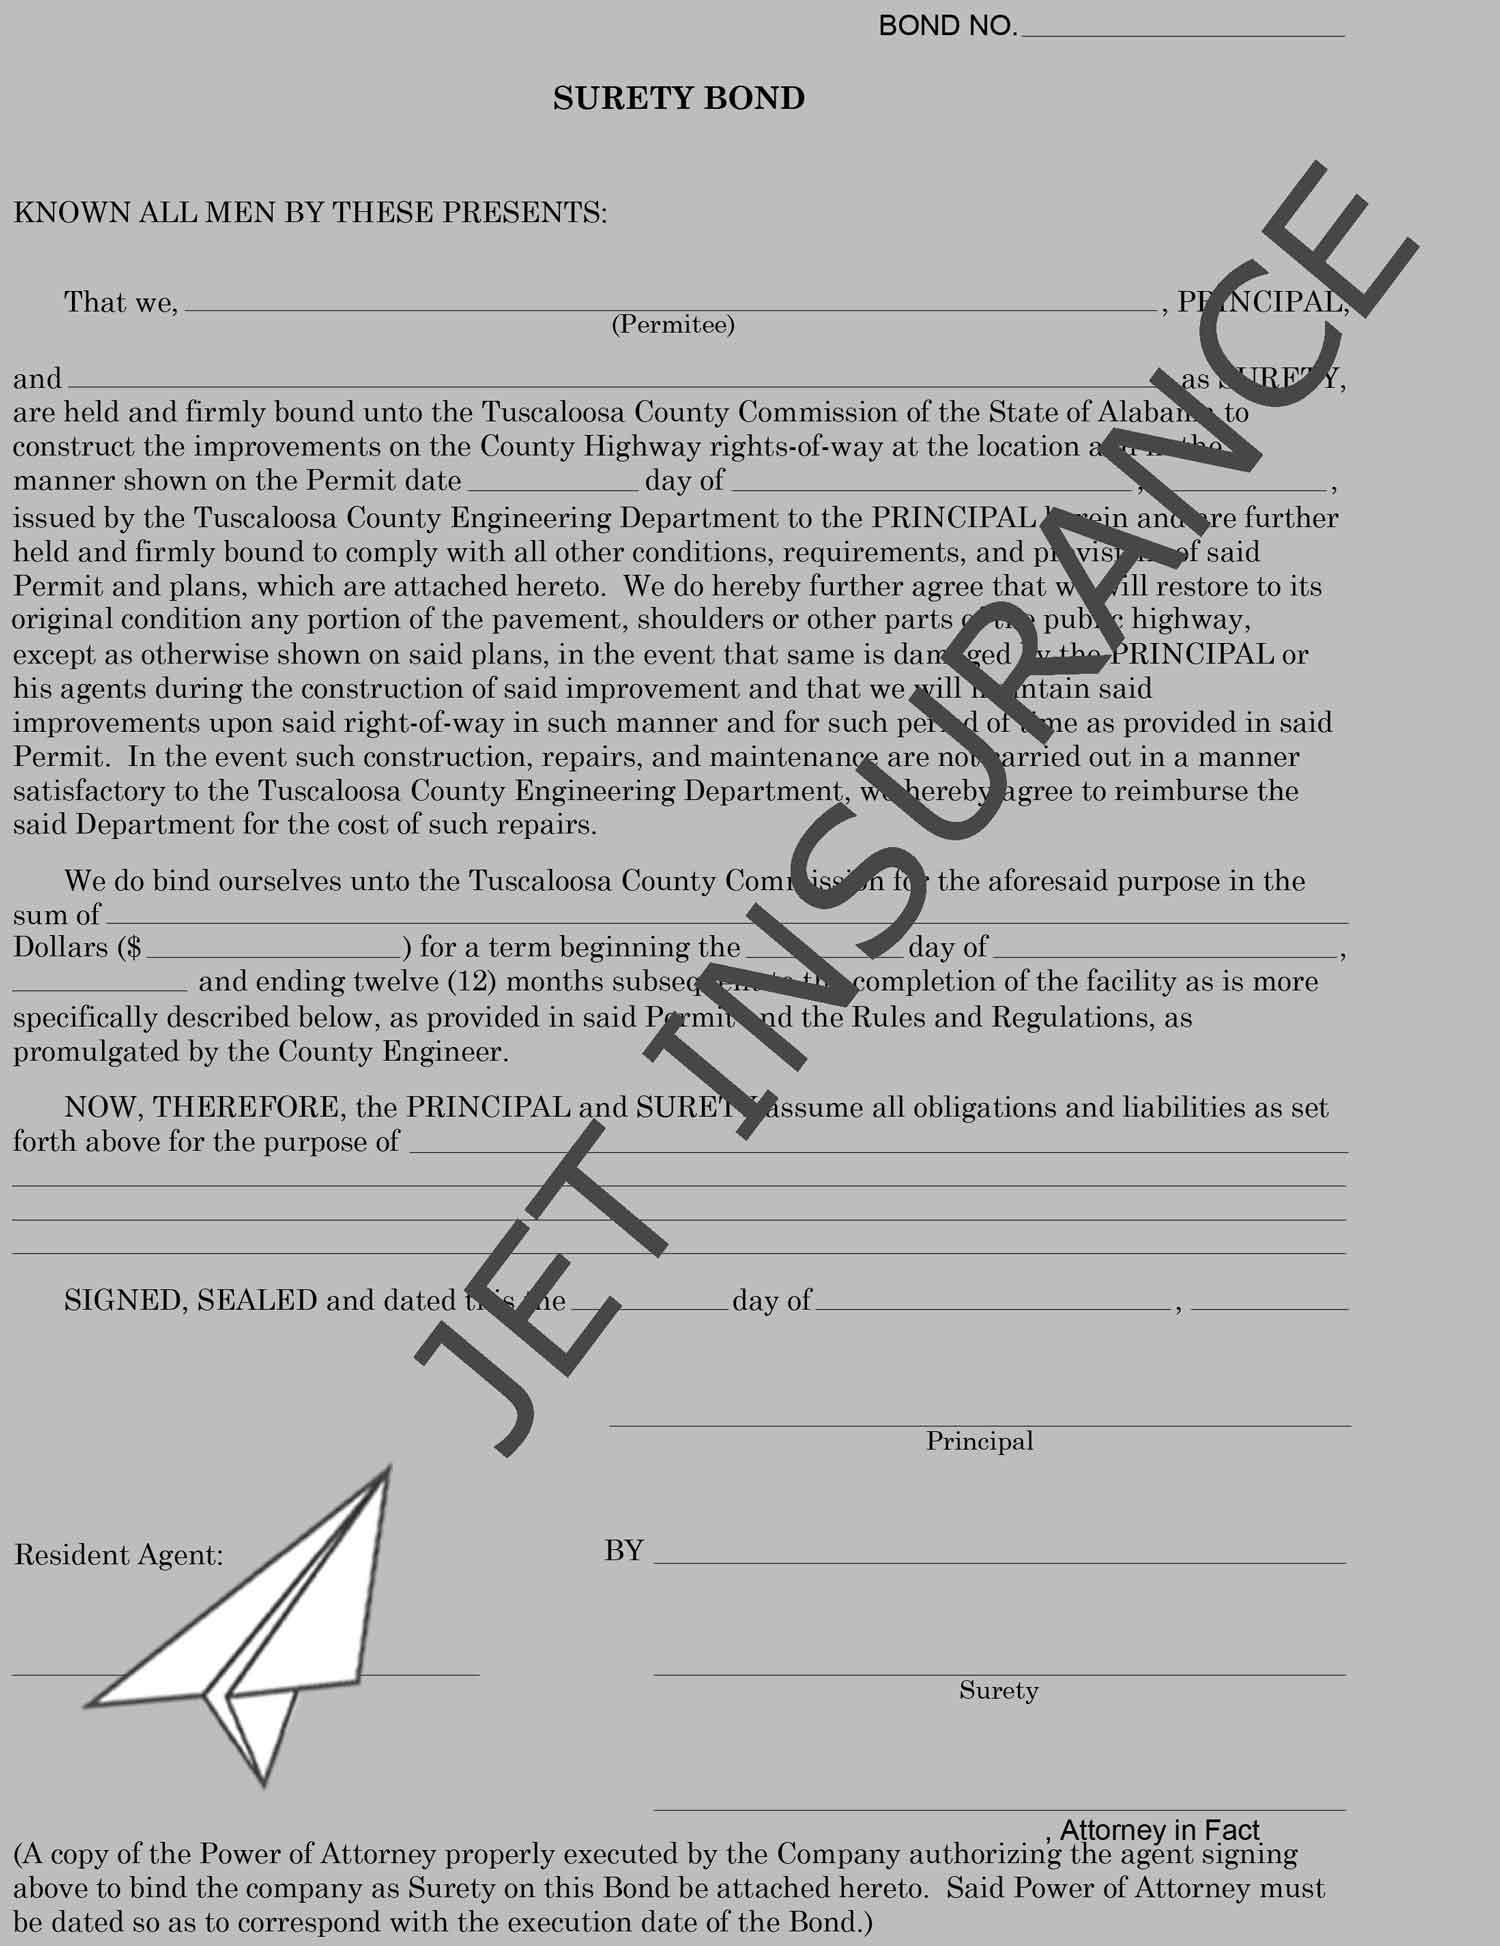 Alabama iron workers union 92 wage and welfare bond